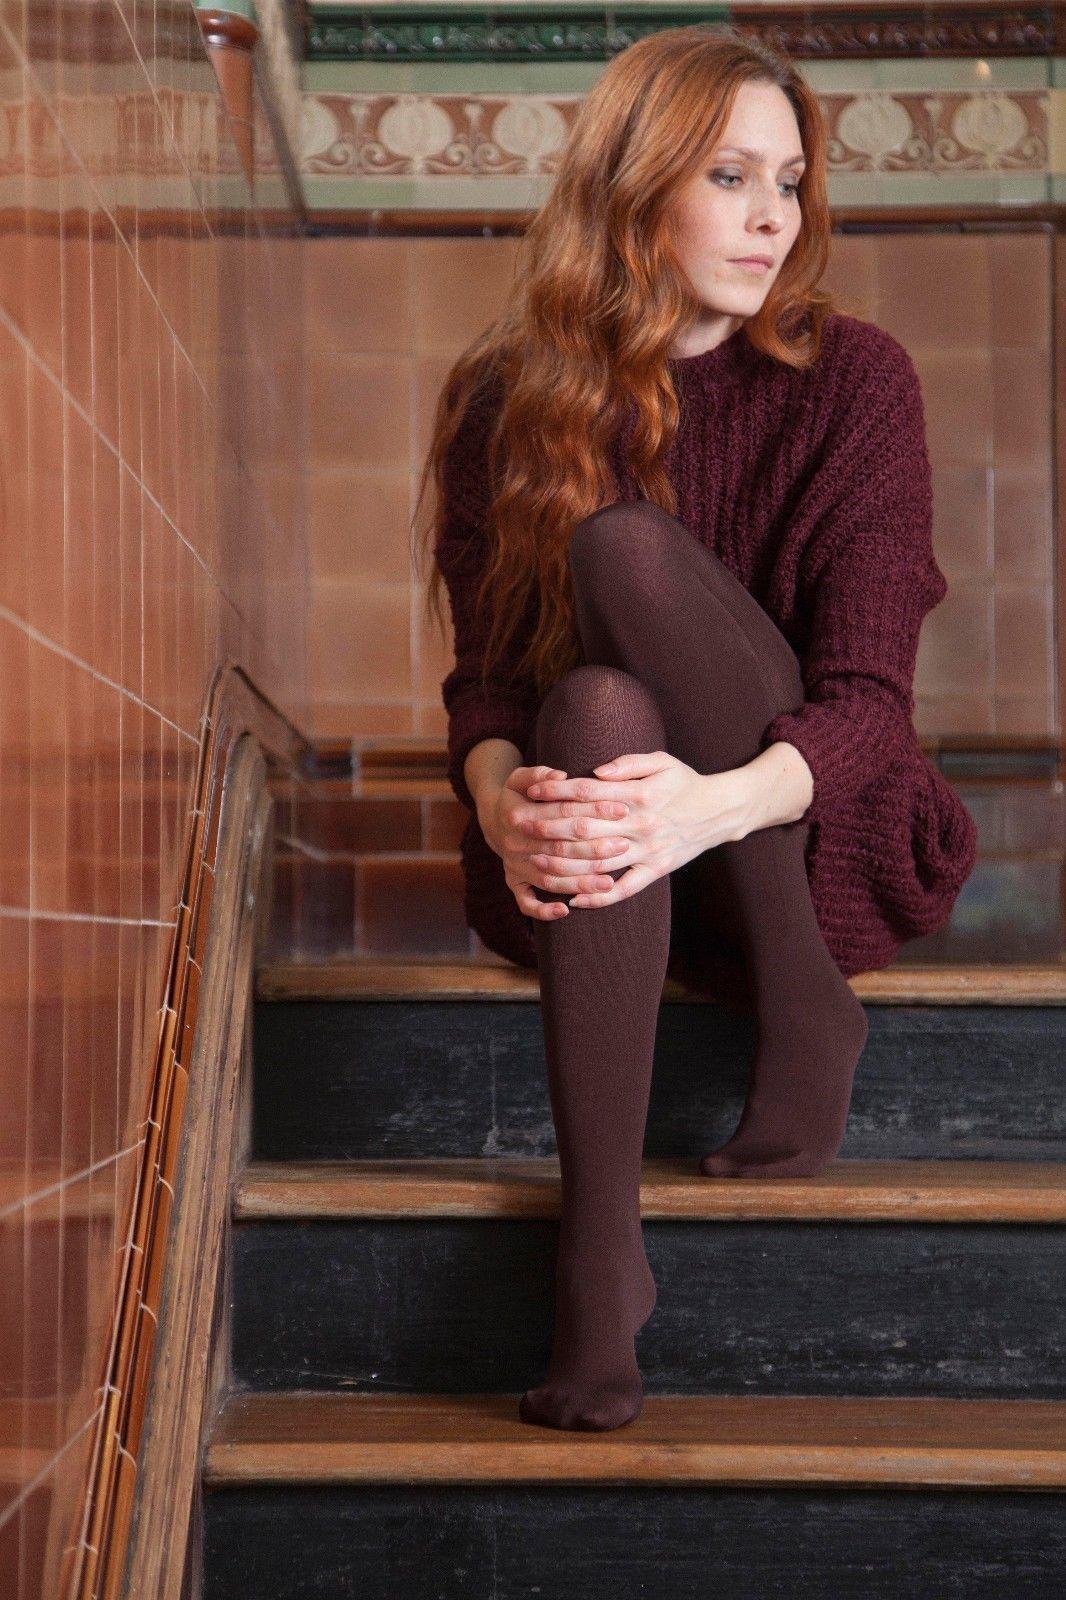 Heat Holders - Damen winter warm blickdicht bunt thermo strumpfhose in 4 farben